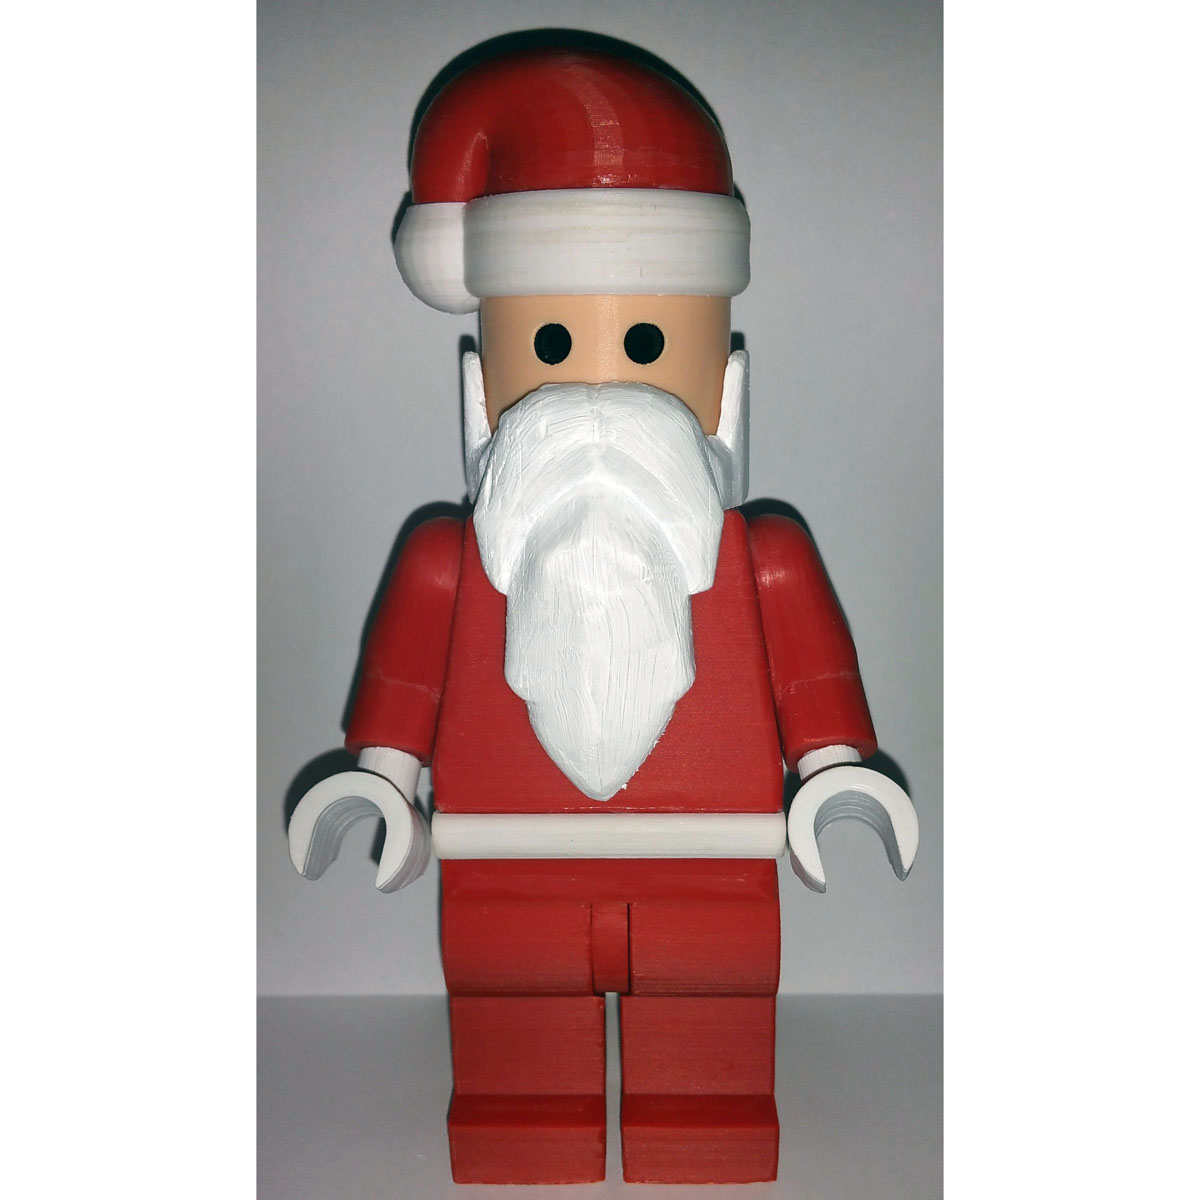 Lego_Minifig_-_Santa_Clause_1.jpg Download free STL file Jumbo Christmas - Santa Claus • 3D printer template, HowardB